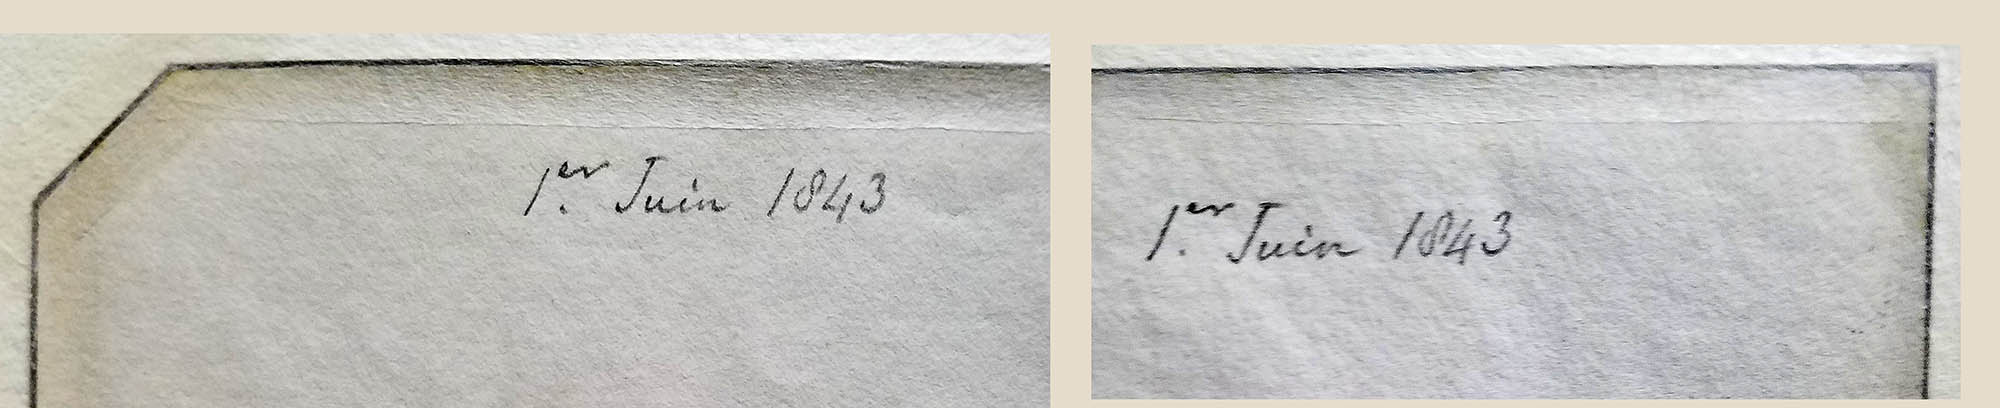 inscribe-neg